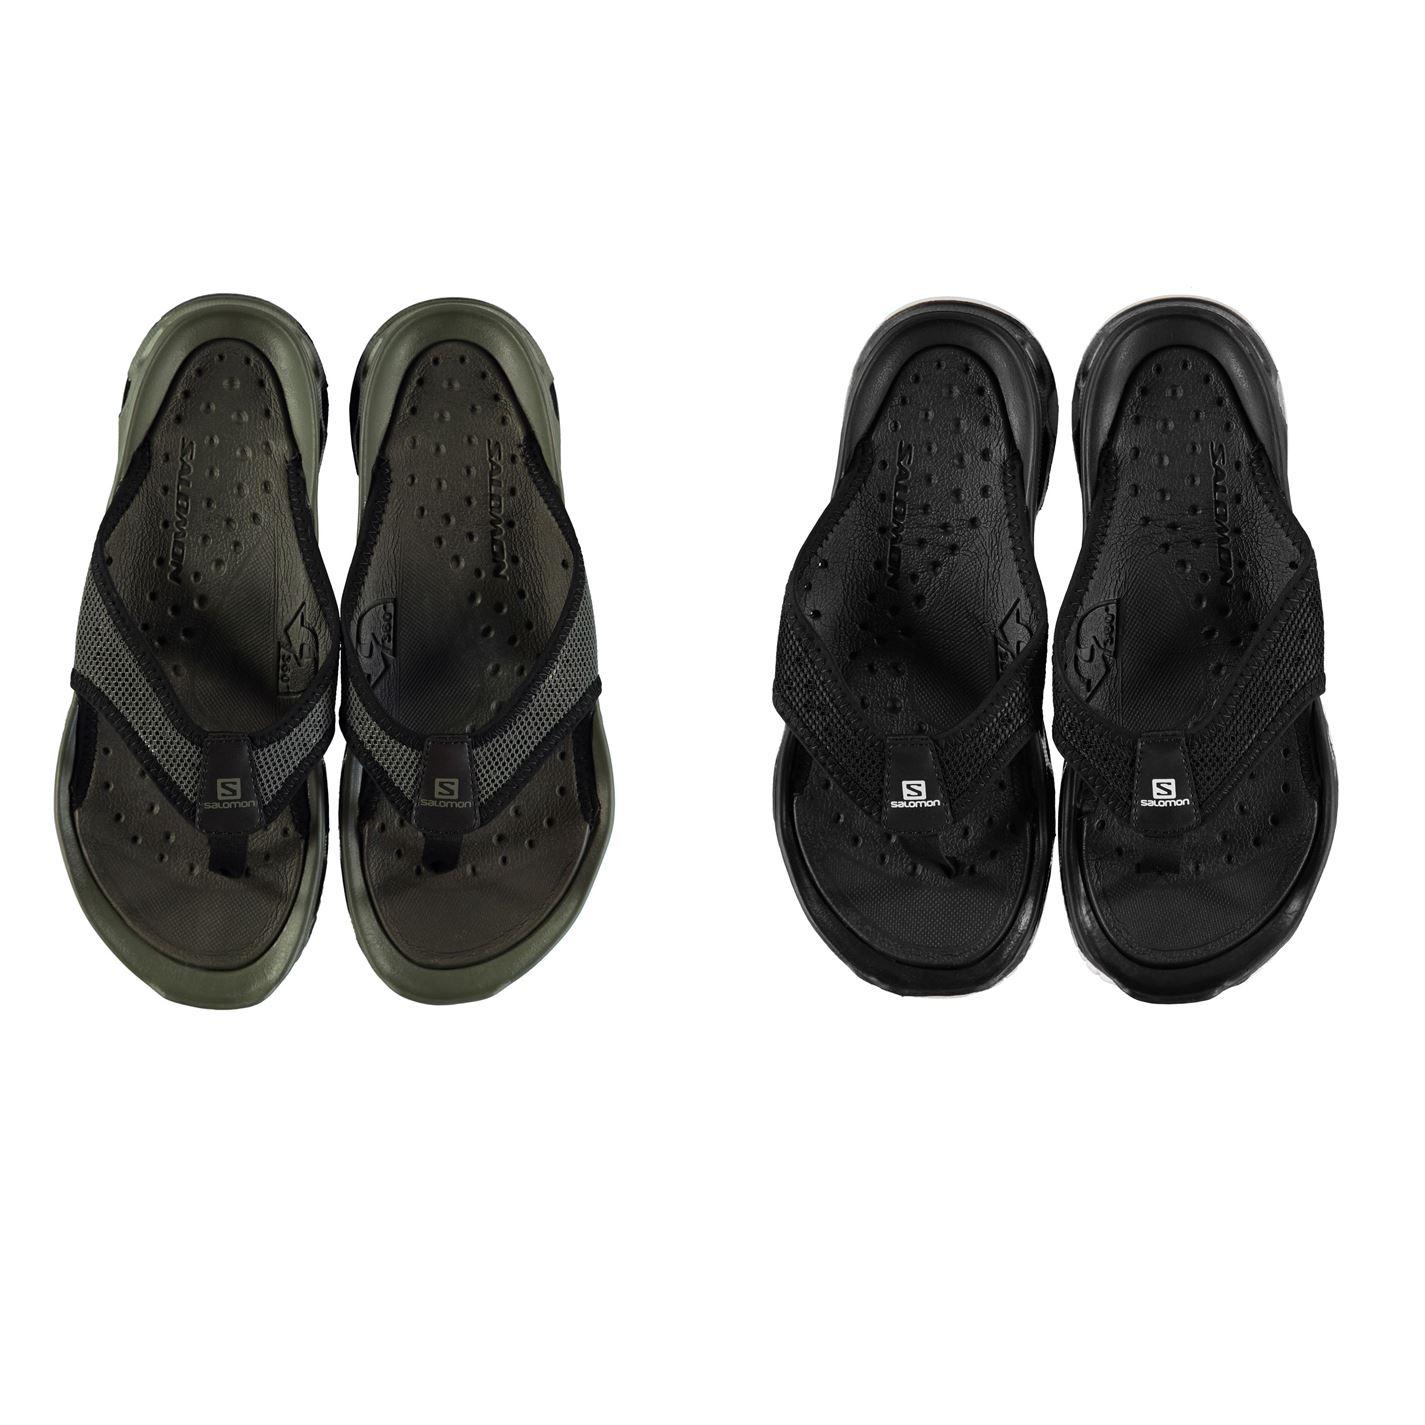 Details about Salomon RX Break Mens Sandals Outdoor Footwear Flip Flops